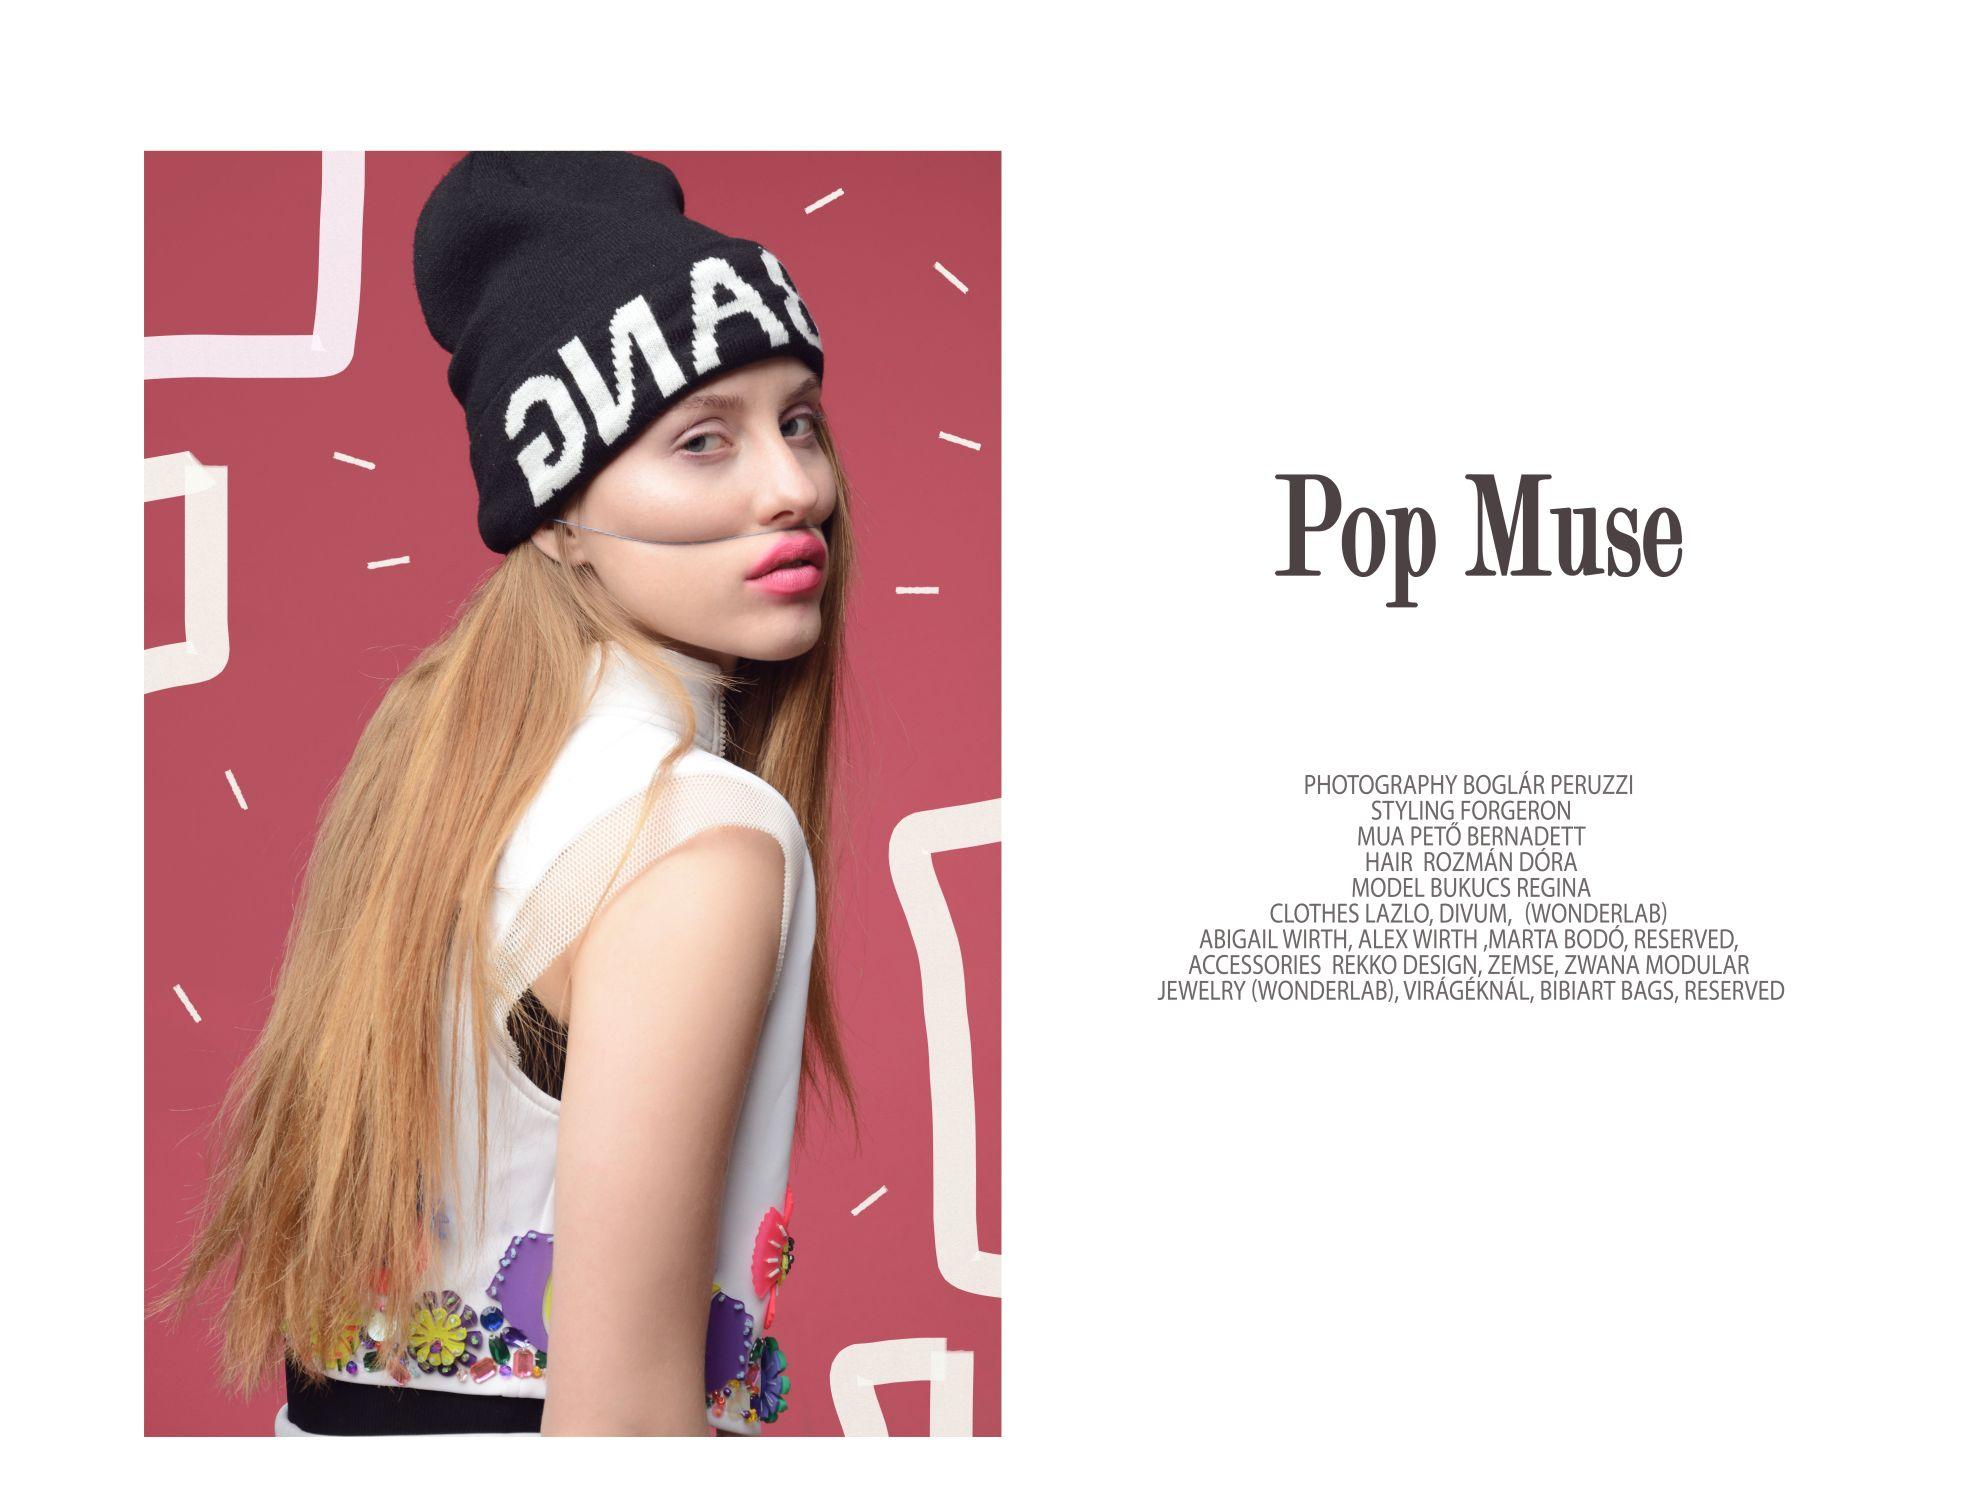 Pop Muse (1)